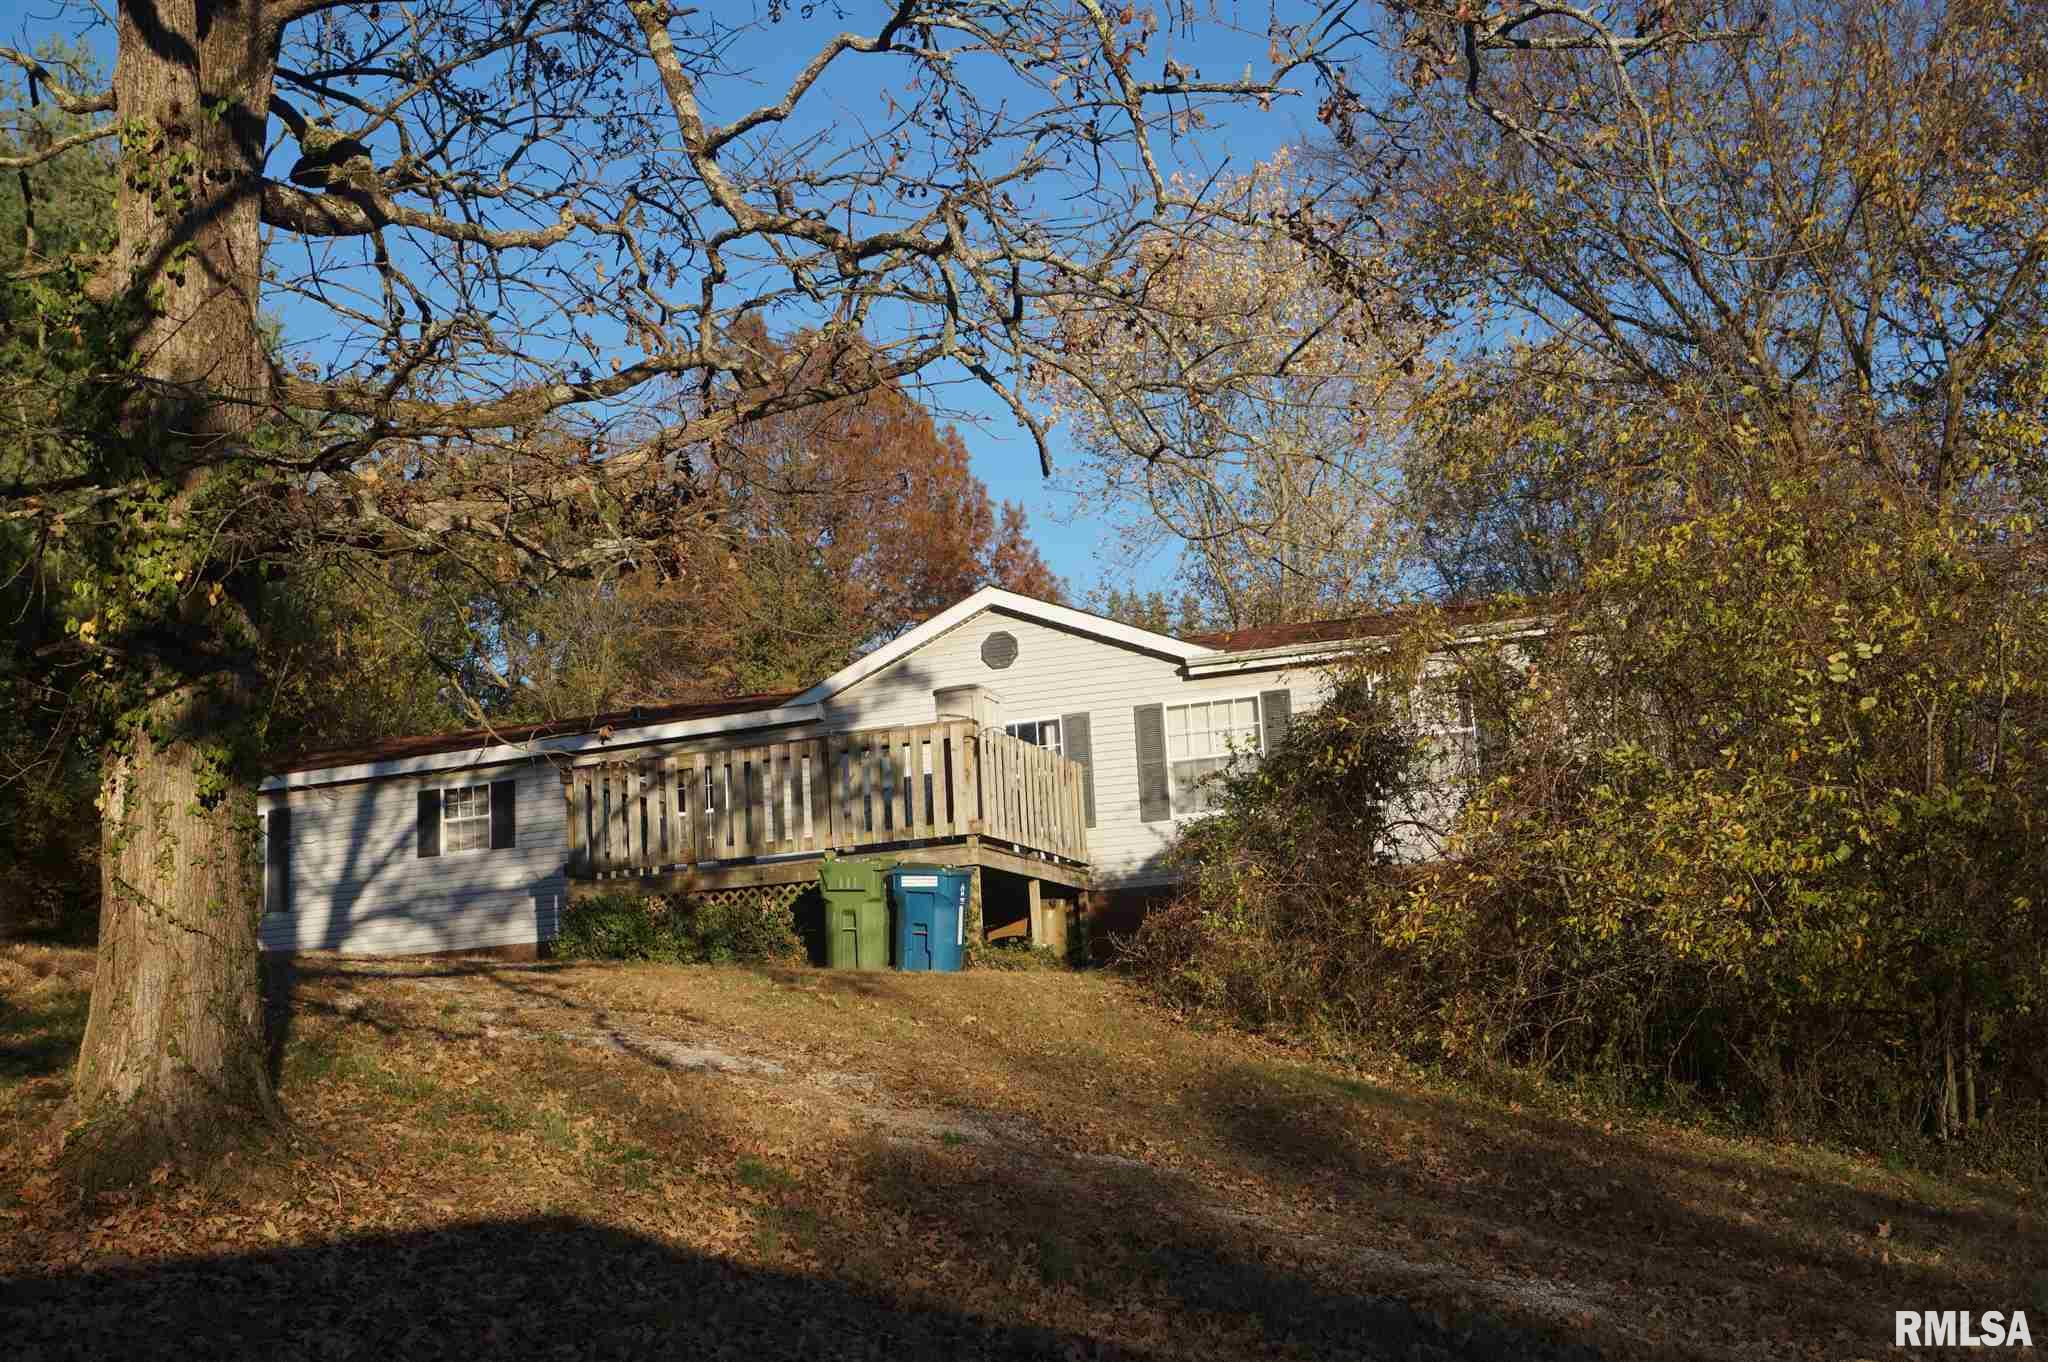 113 Nicholson Property Photo - Cobden, IL real estate listing